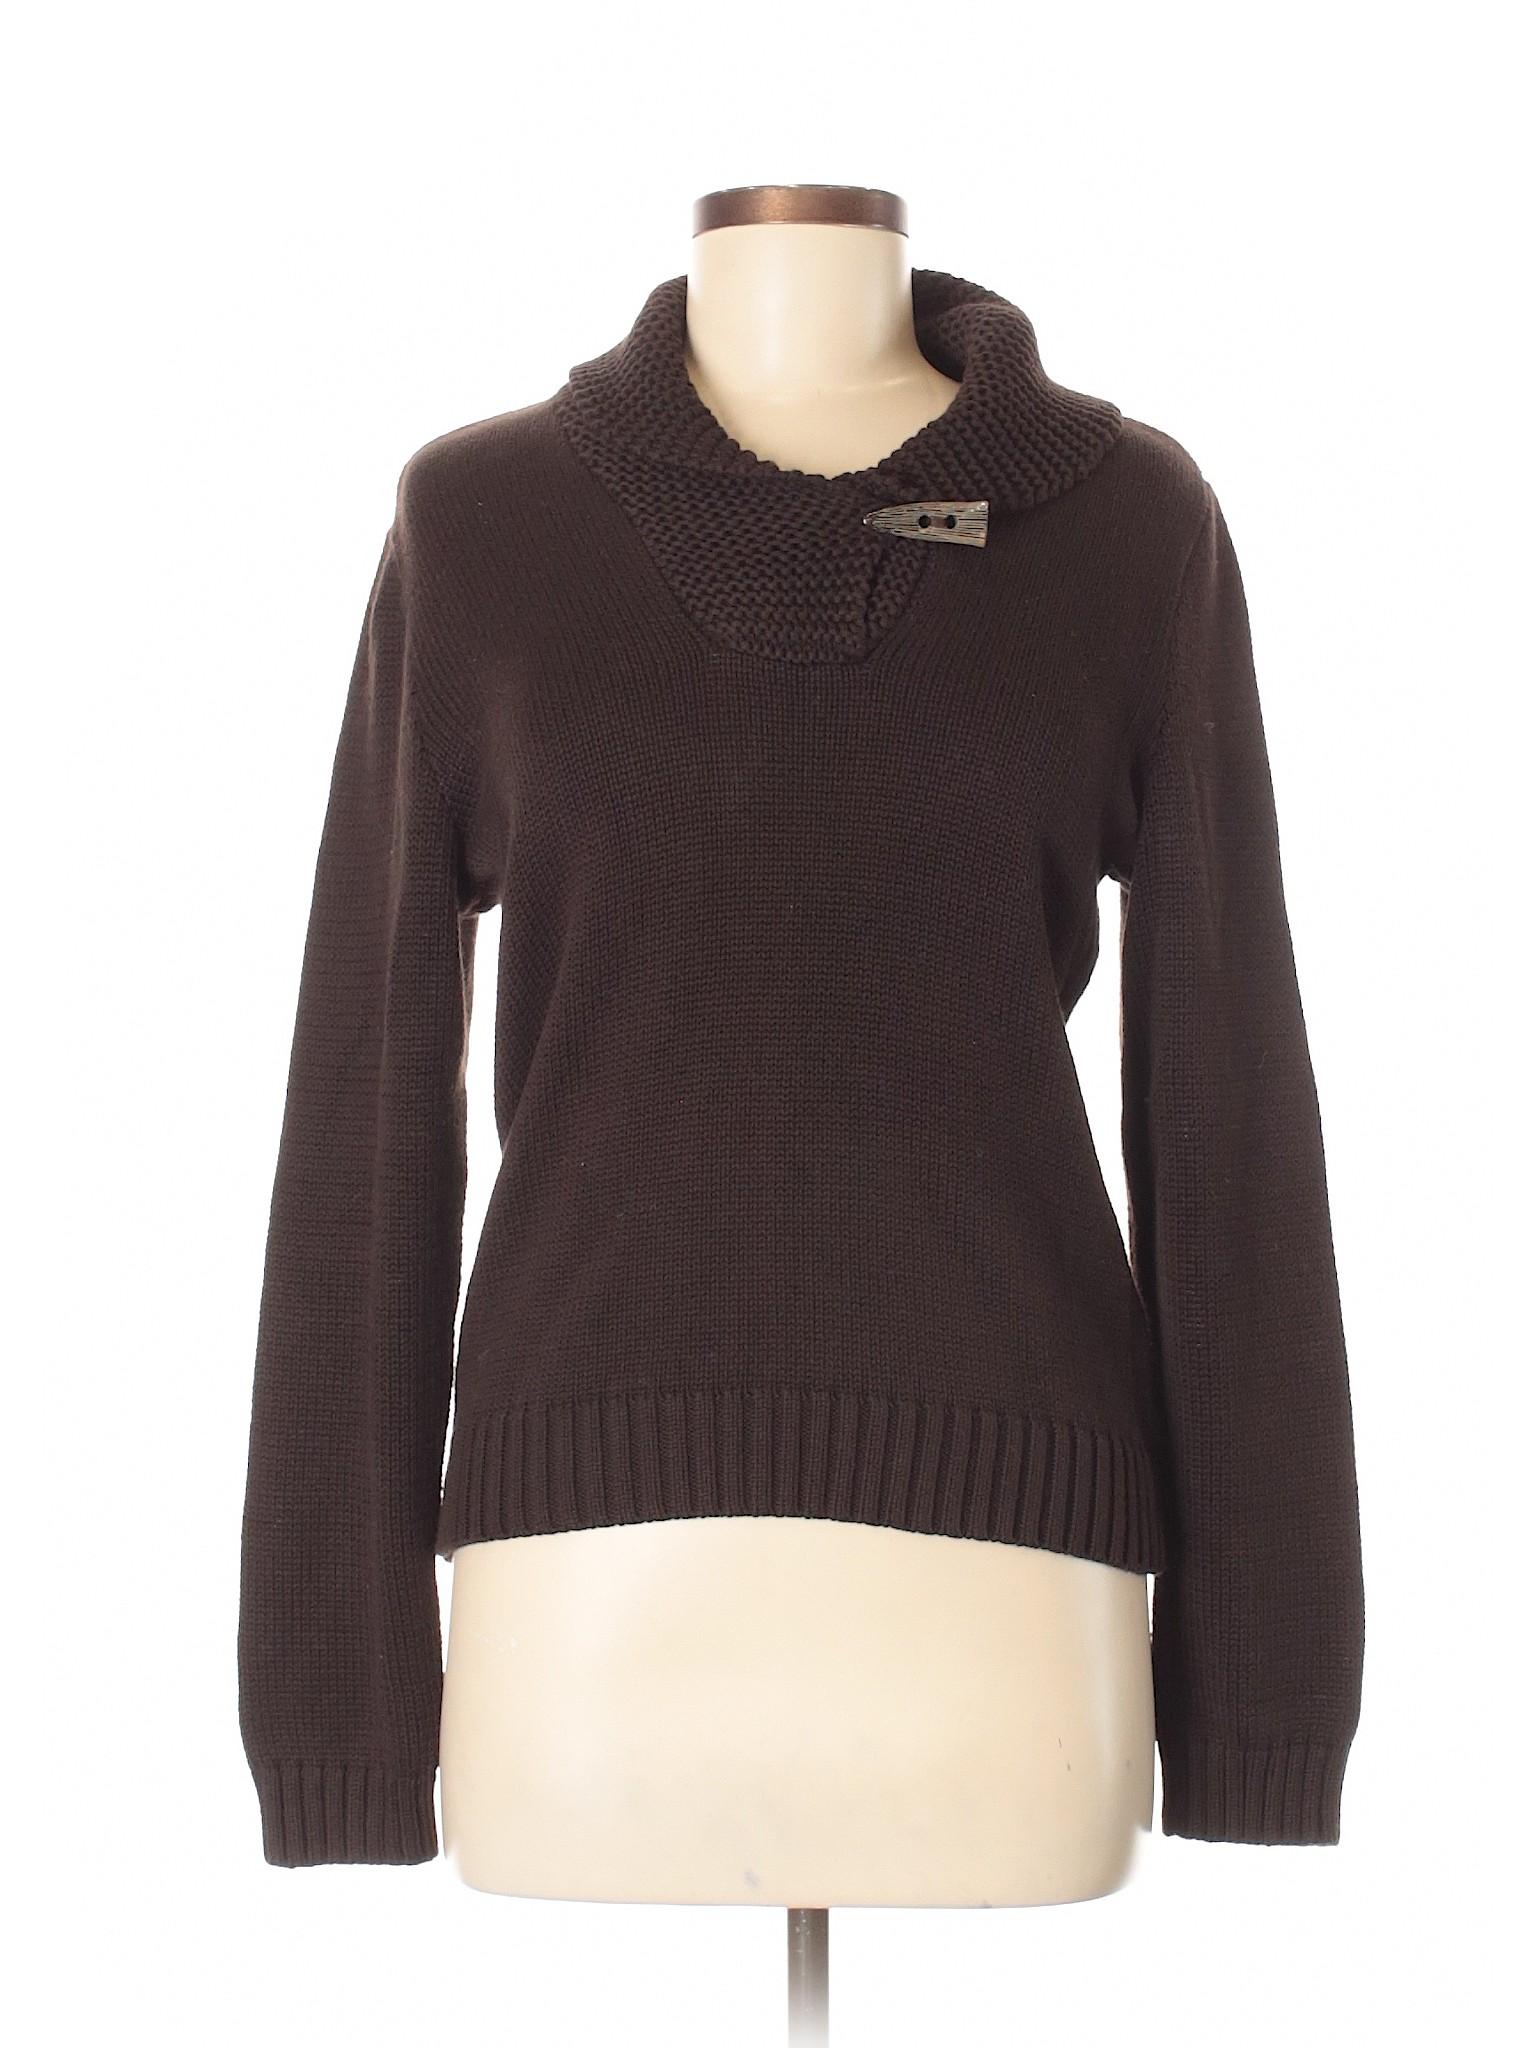 by Lauren Pullover Sweater Ralph Boutique Lauren nBA4xfc0W